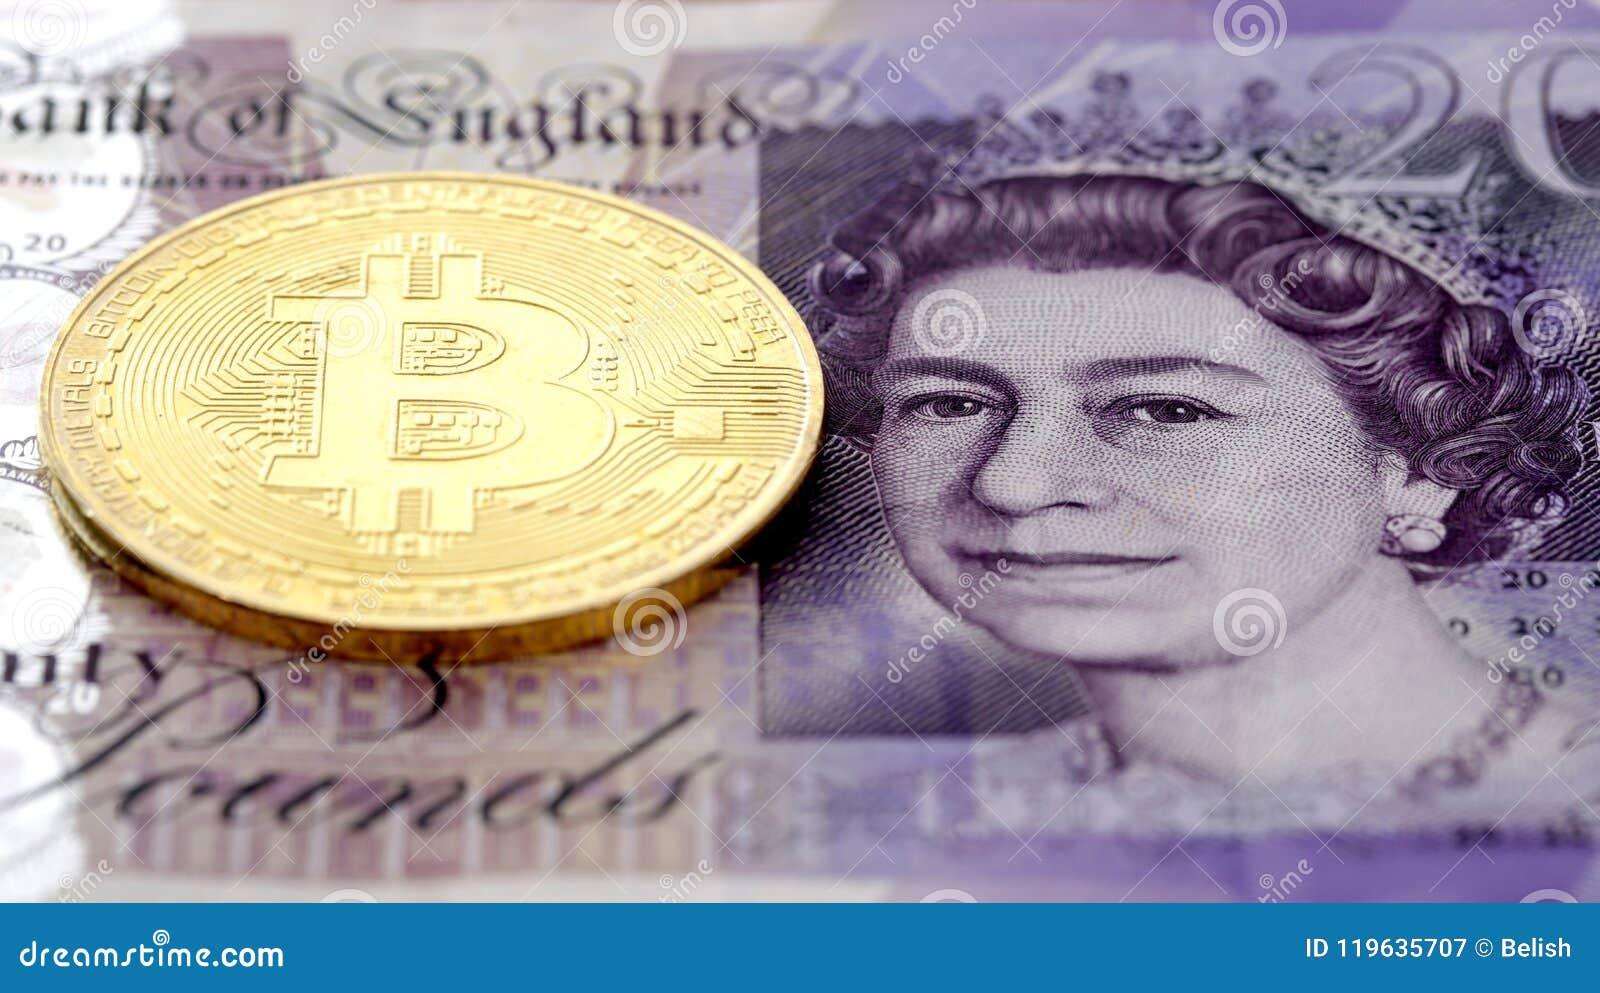 Converti da Sterlina britannica a Bitcoin | GBP / BTC Convertitore di valute - Valuta EX